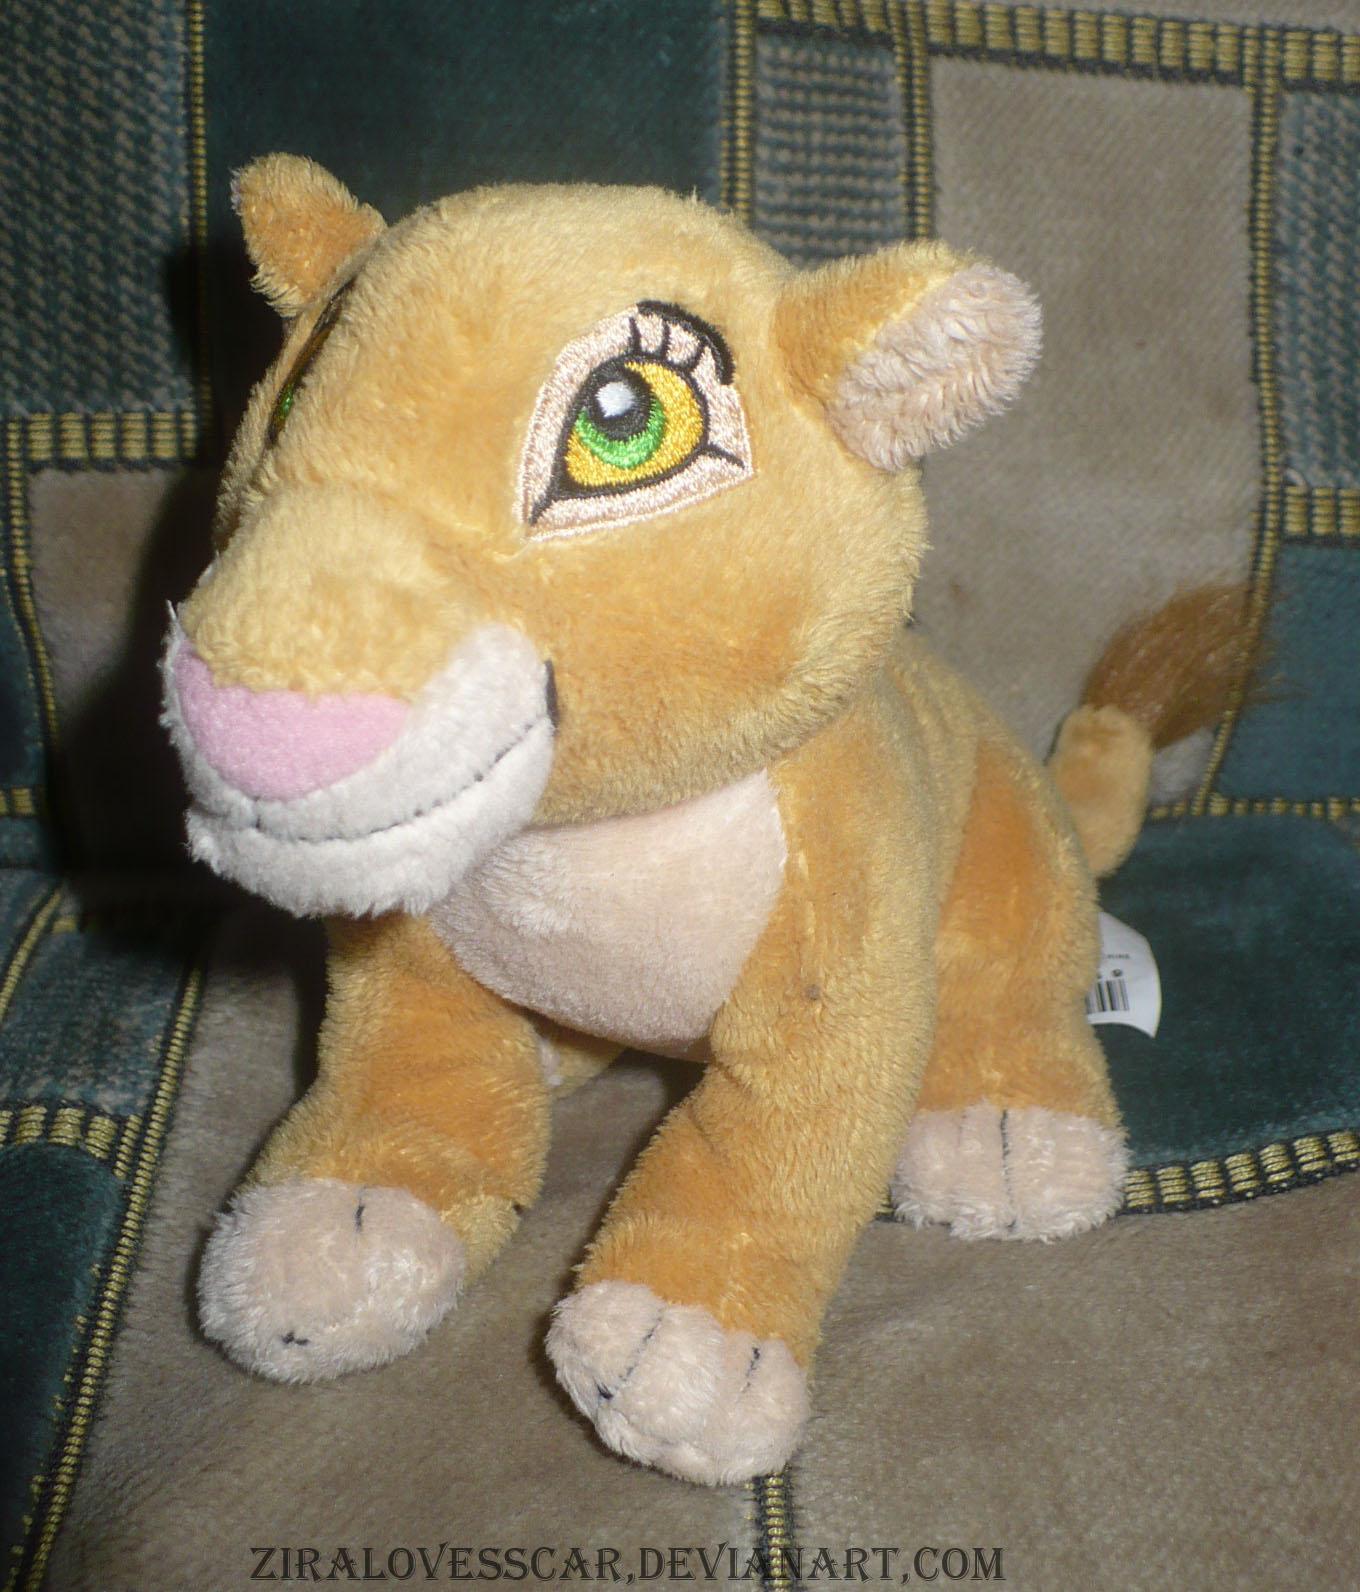 Nala Plush Stuffed Animal TLK By ZiraLovesScar On DeviantArt